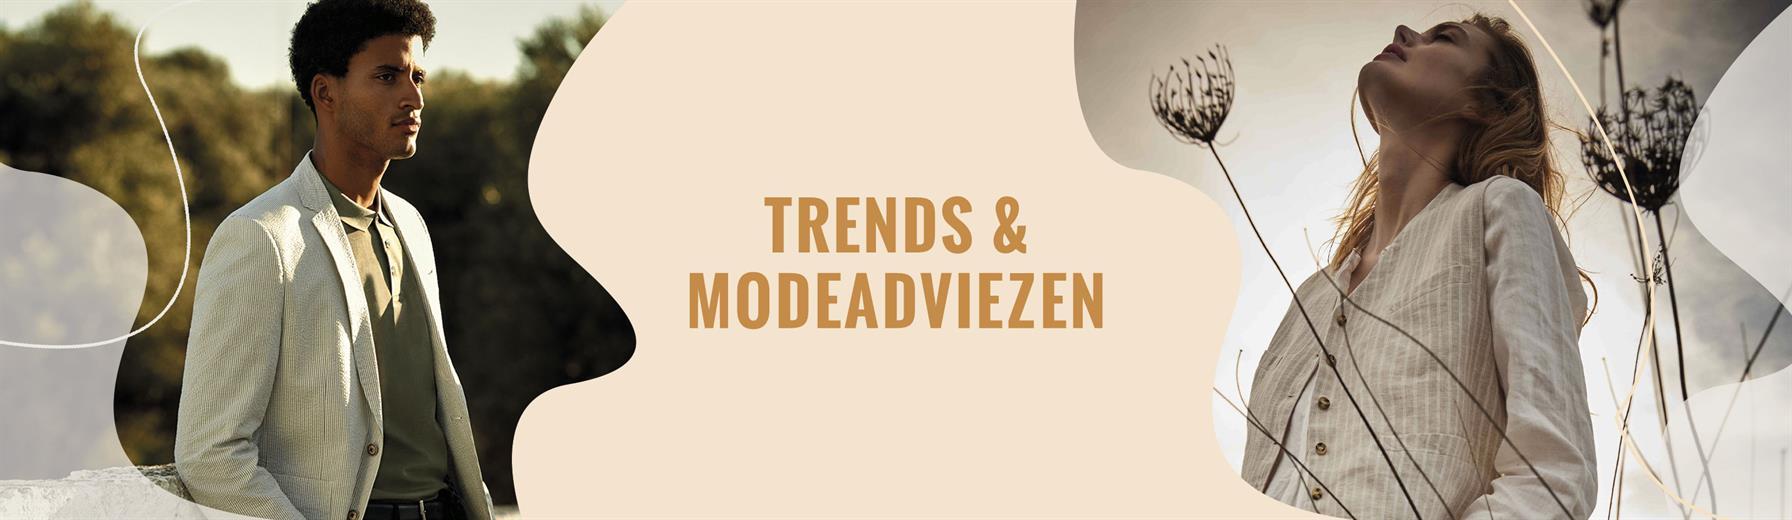 Trends & modeadvies